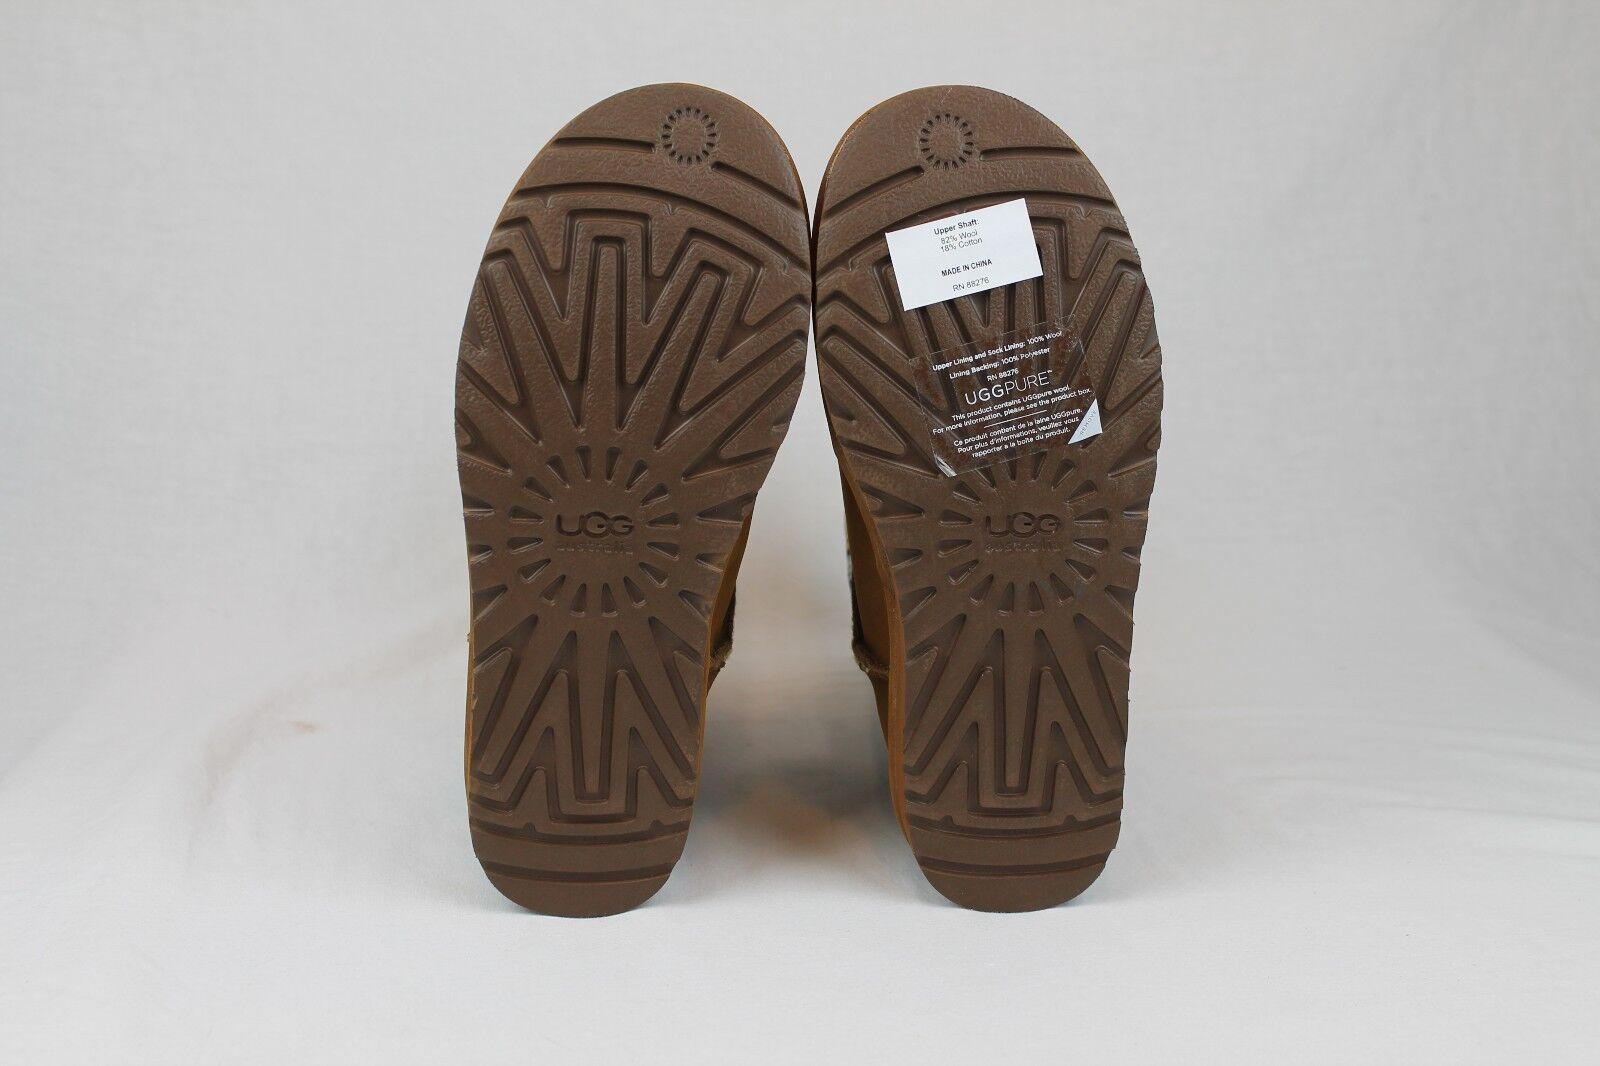 44d4c8f1f62 Authentic UGG Pendleton Classic Tall BOOTS US 6 EU 37 Chestnut